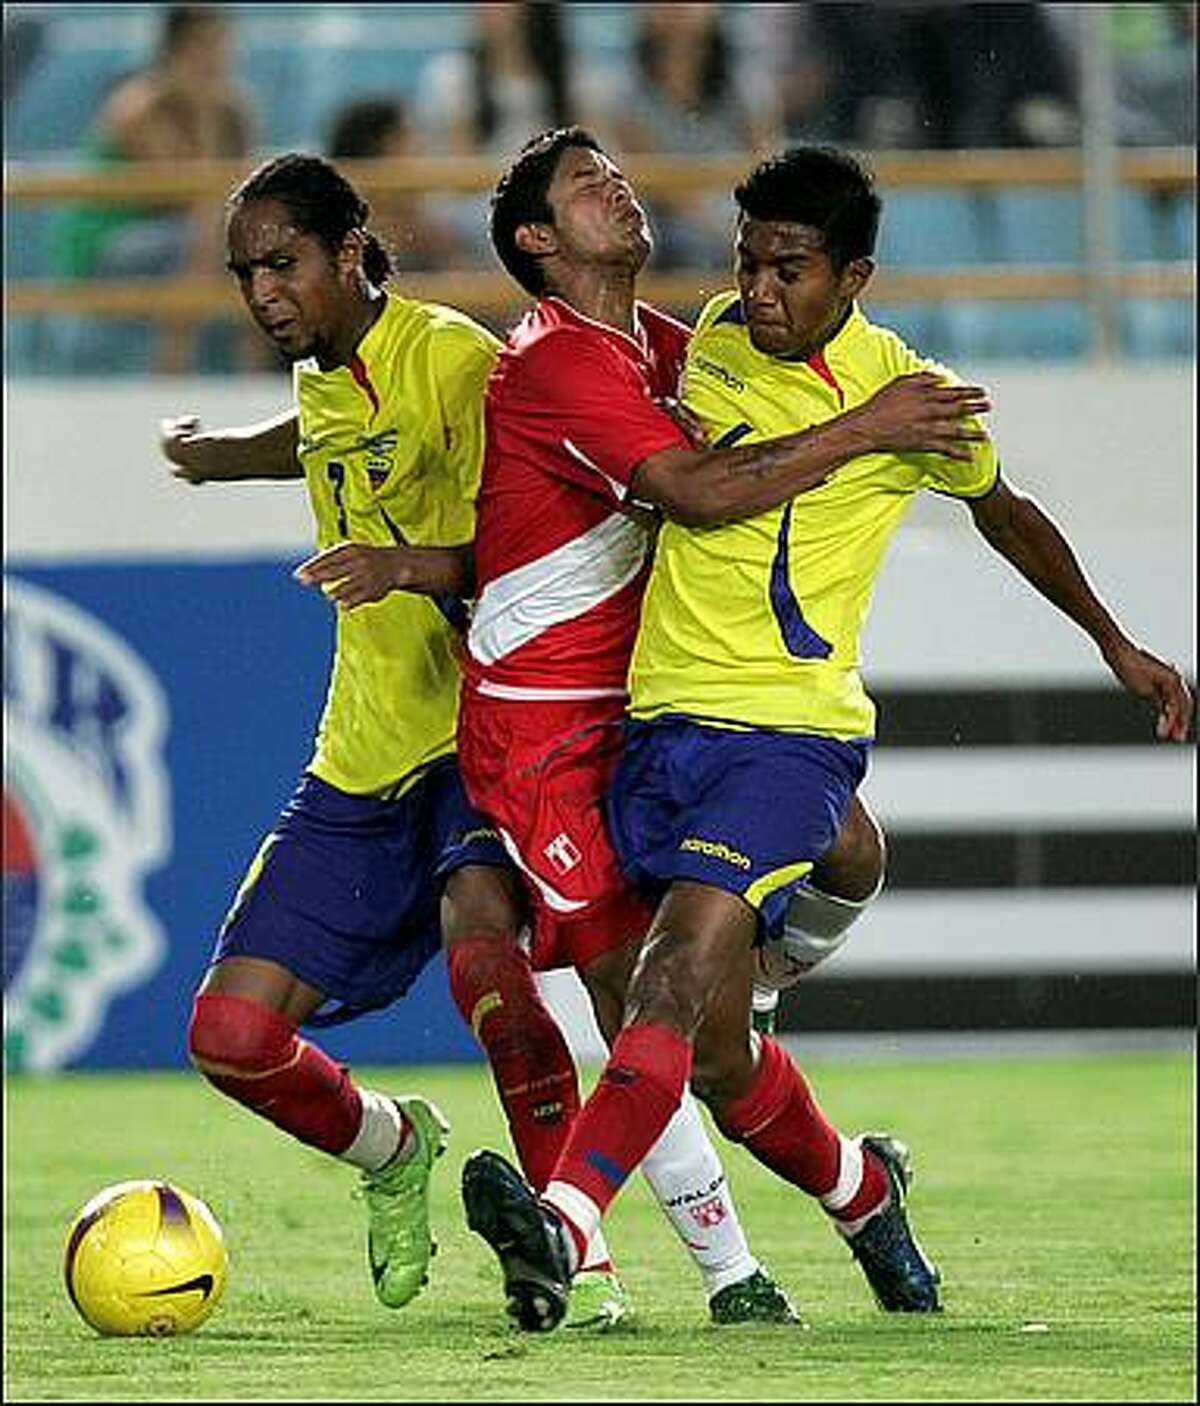 Ecuador's Deison Mendez, left, and Hamilton Shasi, right, push Peru's Reimond Manco during their under-20 South American soccer championship game in Maturin, Venezuela, Monday, Jan 19, 2009. (AP Photo/Fernando Llano)